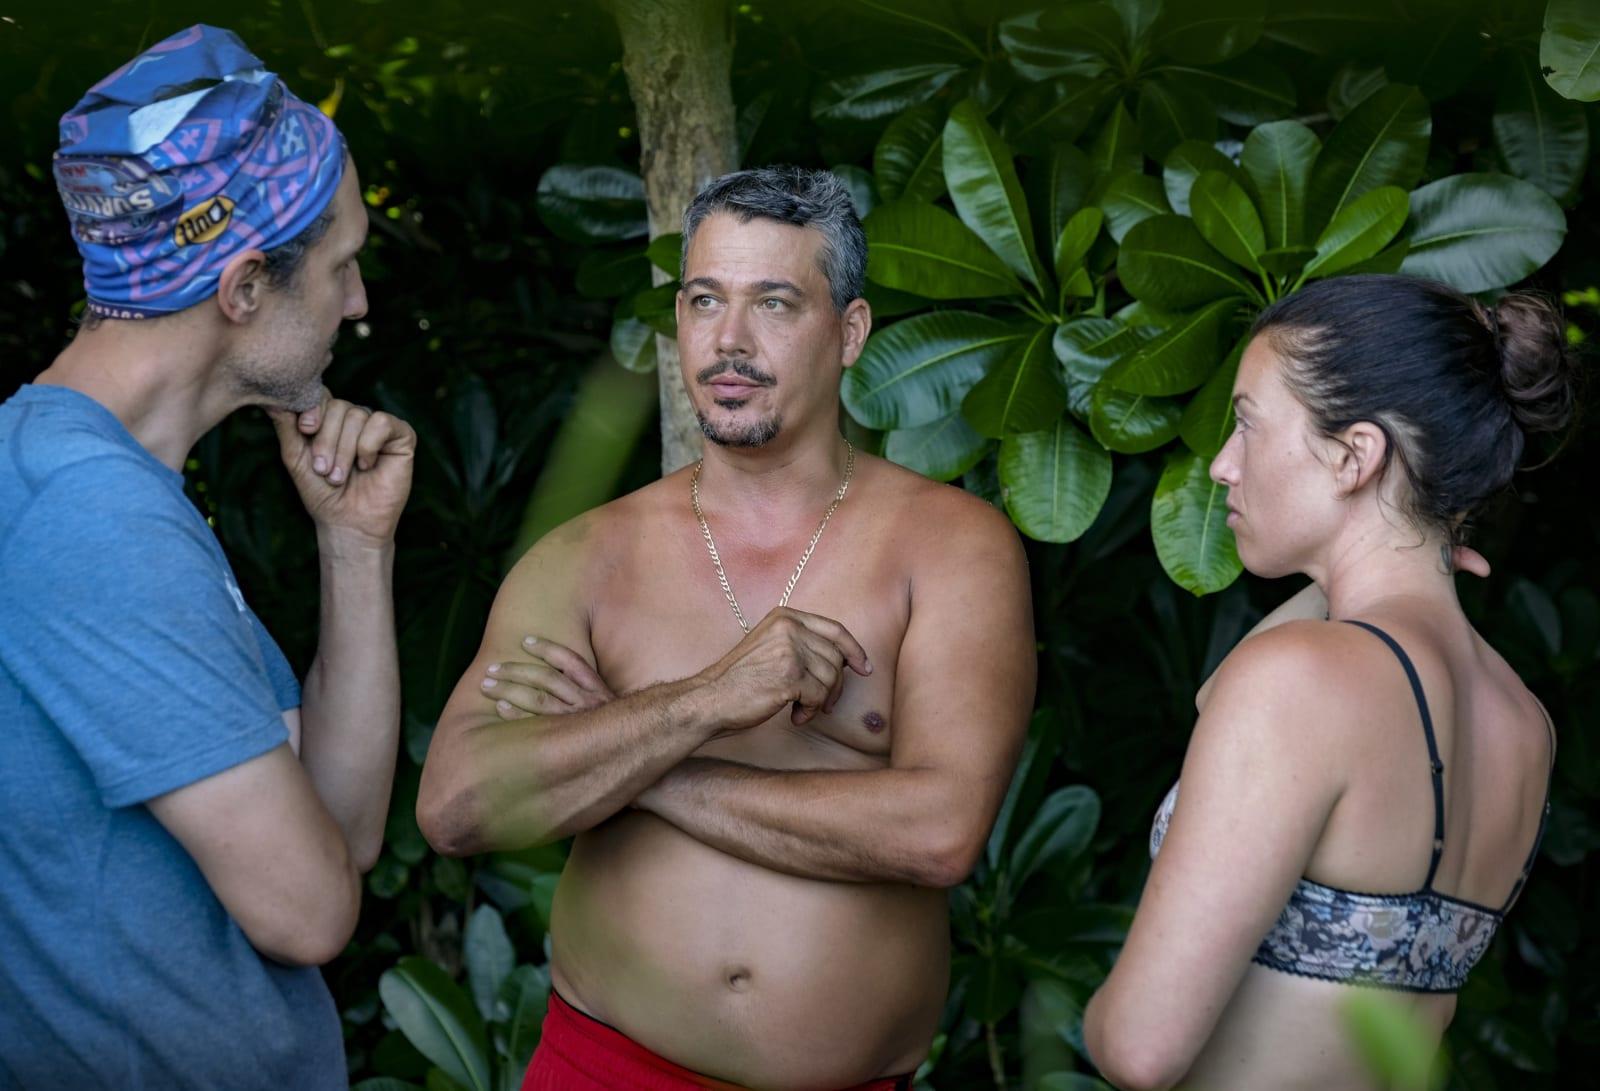 Ethan Zohn Boston Rob Parvati Shallow Survivor Winners at War episode 1